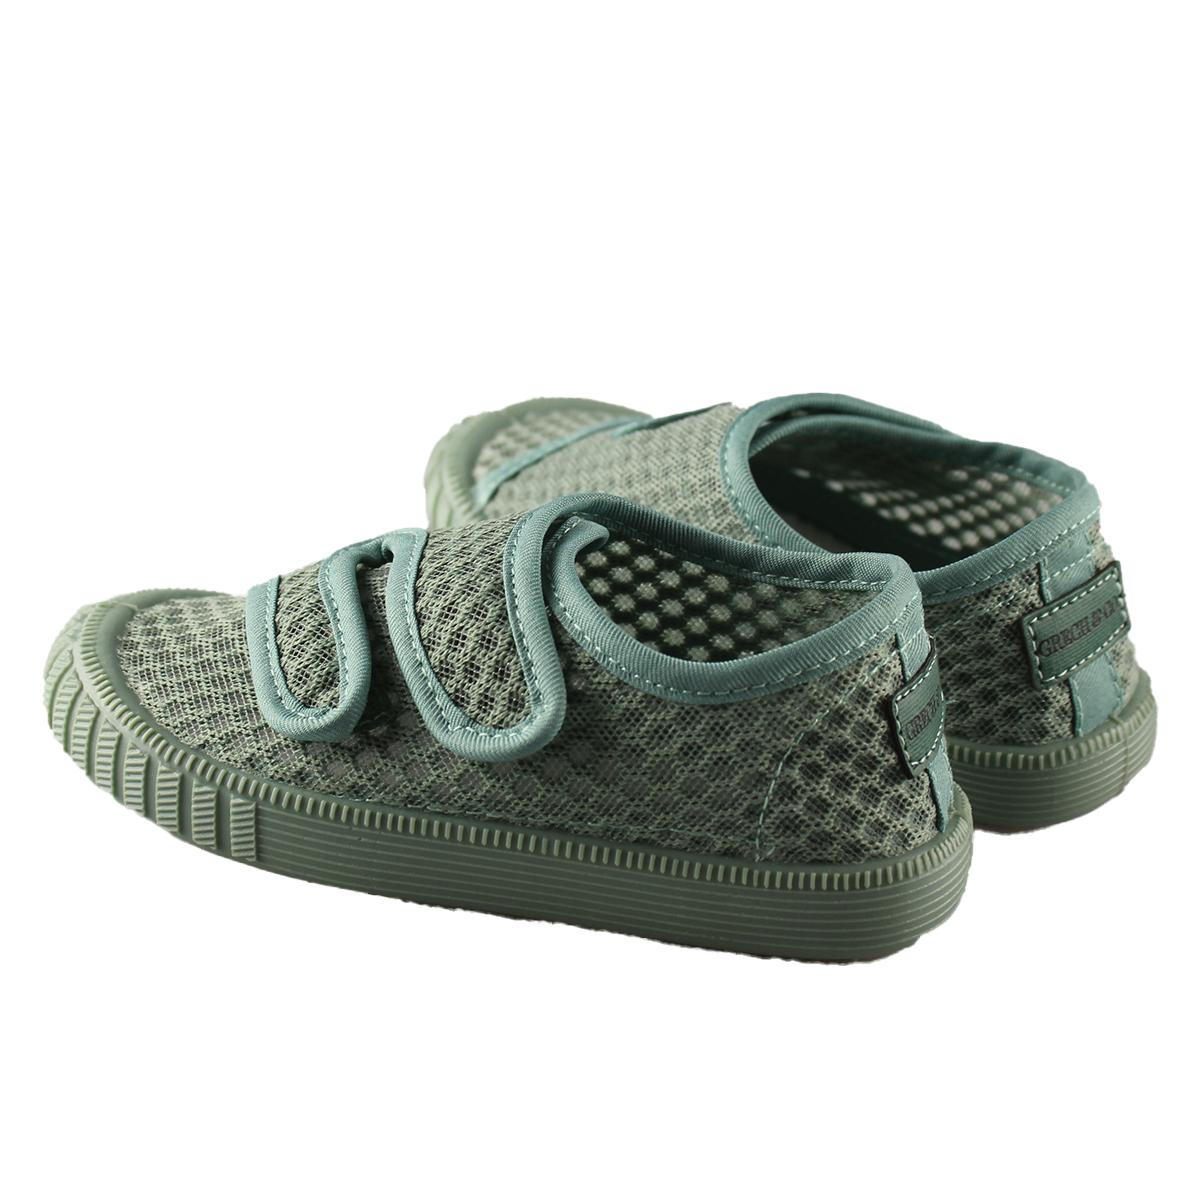 Chaussons & Chaussures Baskets Respirantes à Scratch Fern - 26 Baskets Respirantes à Scratch Fern - 26